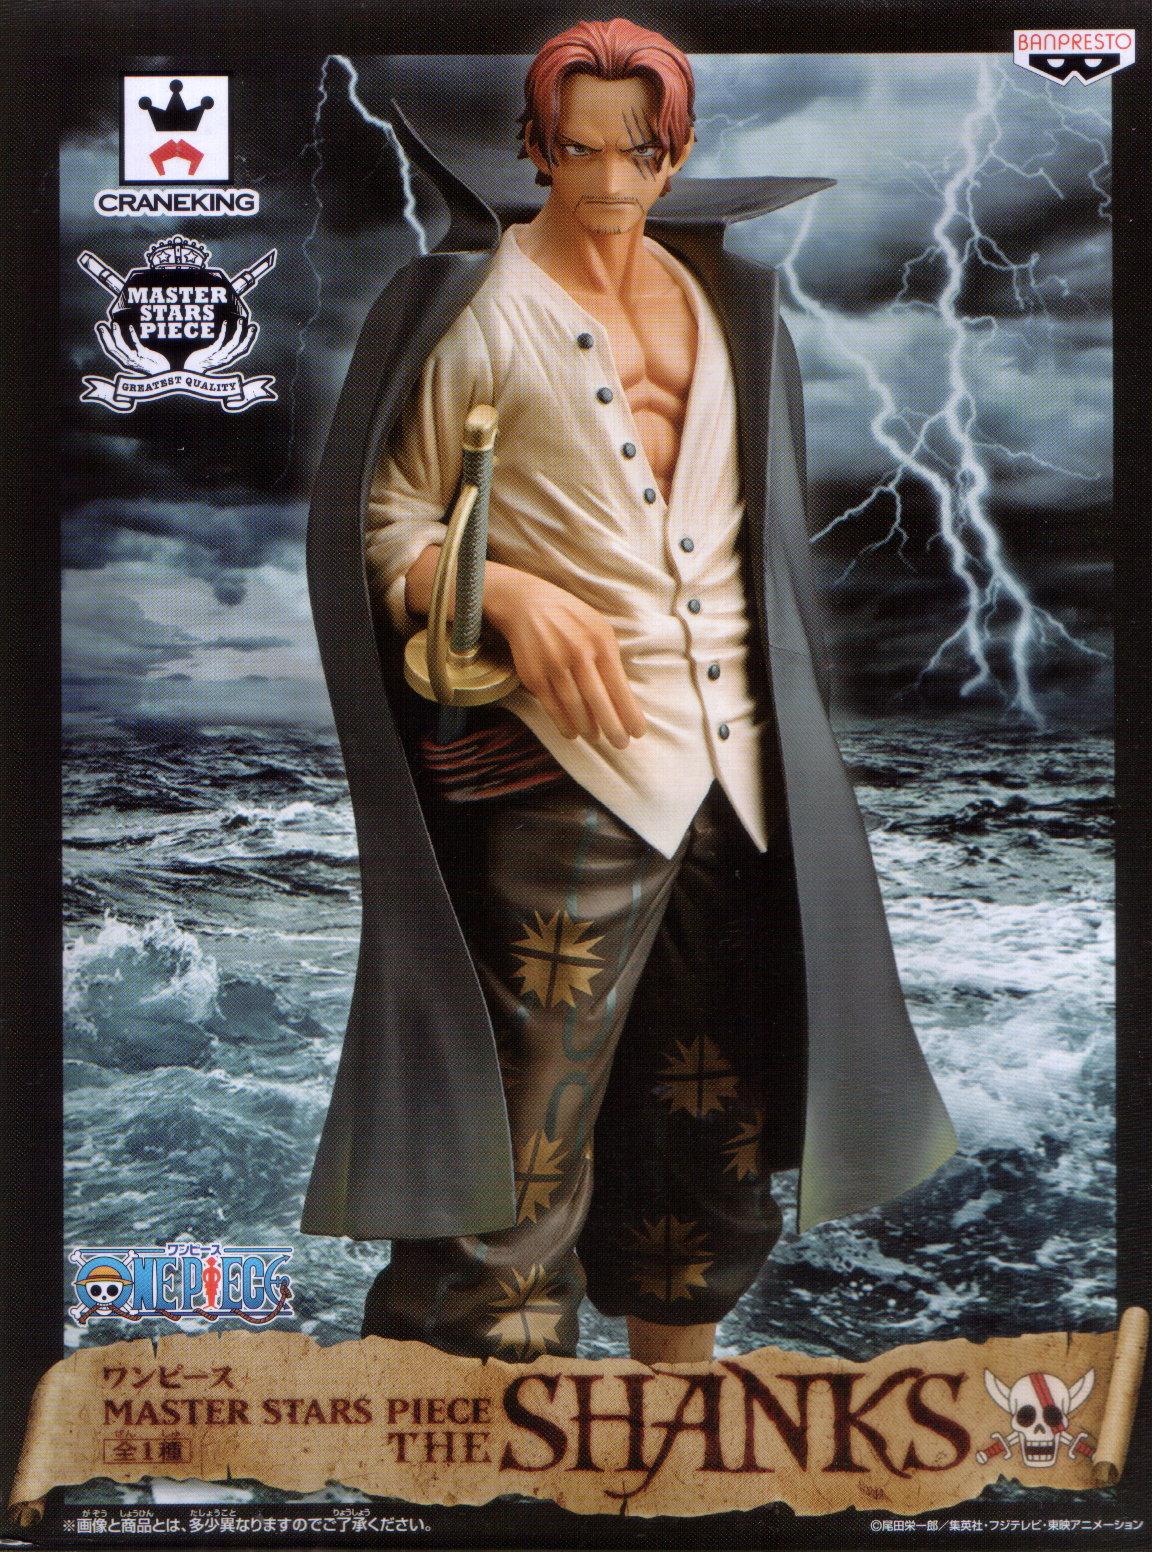 日版金證 MSP 紅髮 香克斯 傑克 四皇 SHANKS 海賊王 One Piece ワンピース